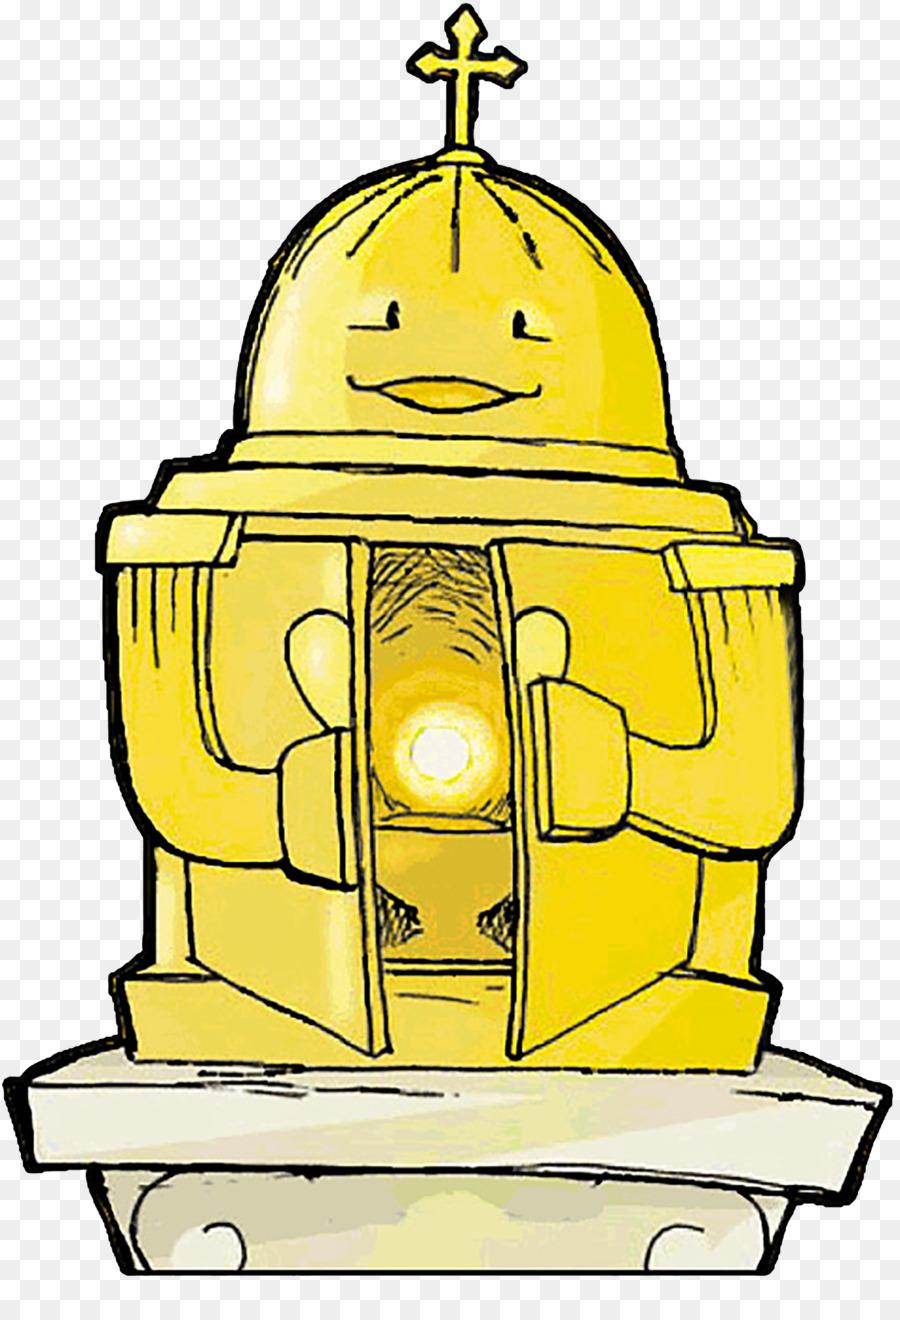 Catholic clipart tabernacle. Church book of exodus